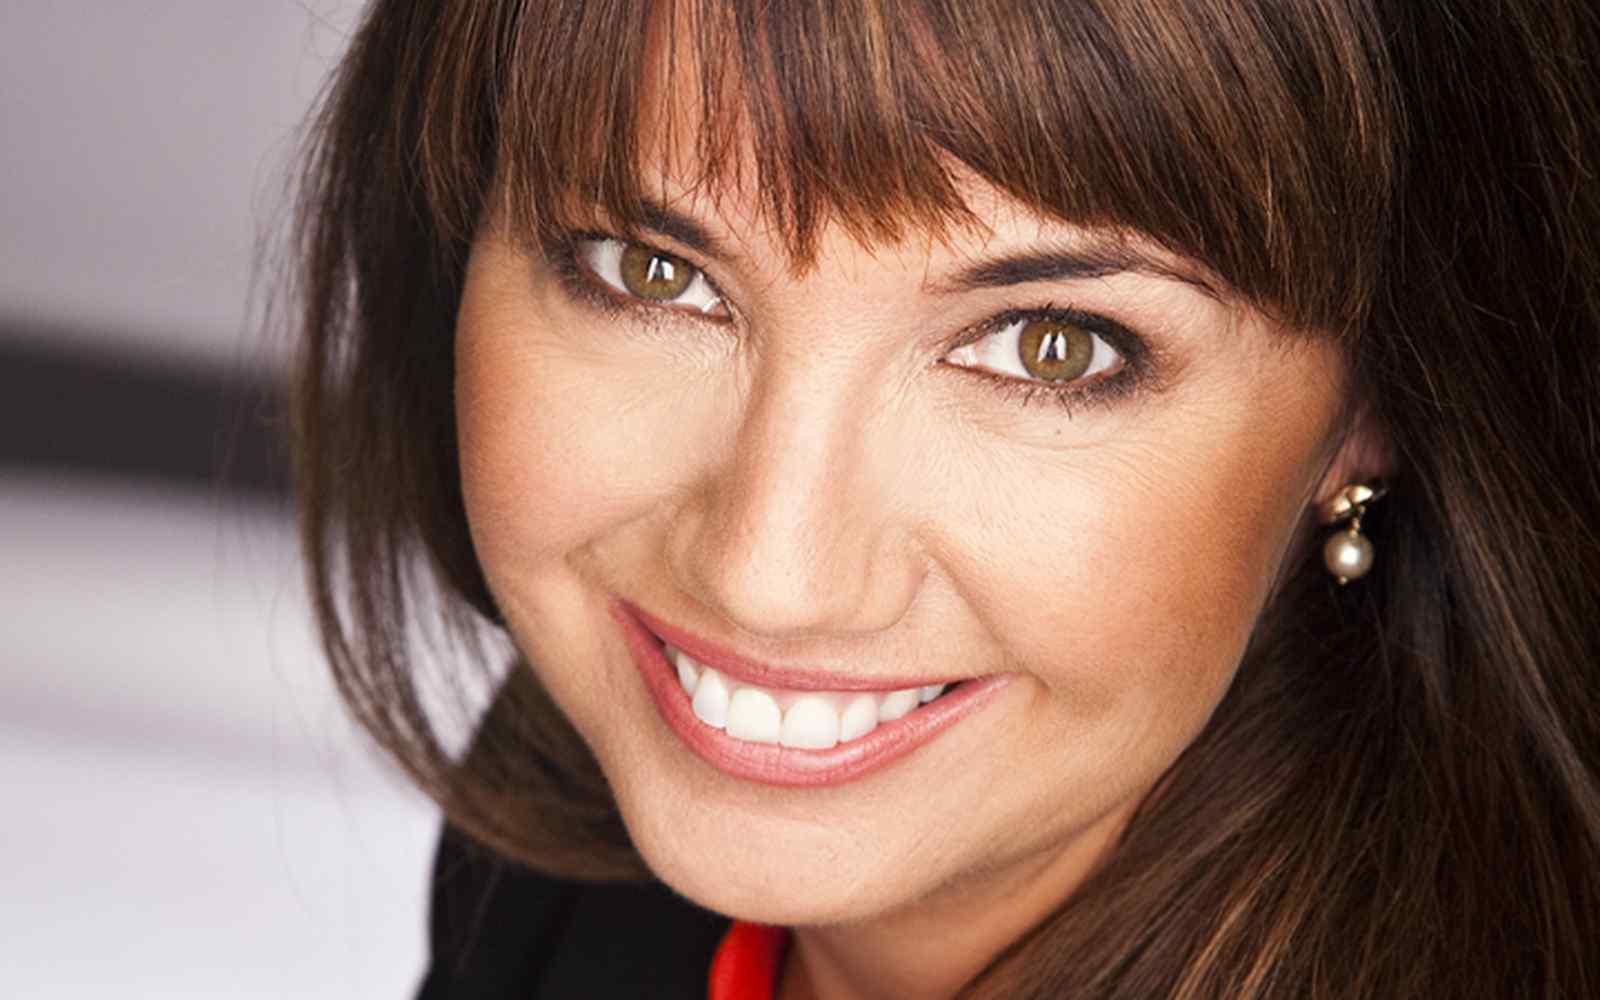 Boohoo co-founder Carol Kane headshot